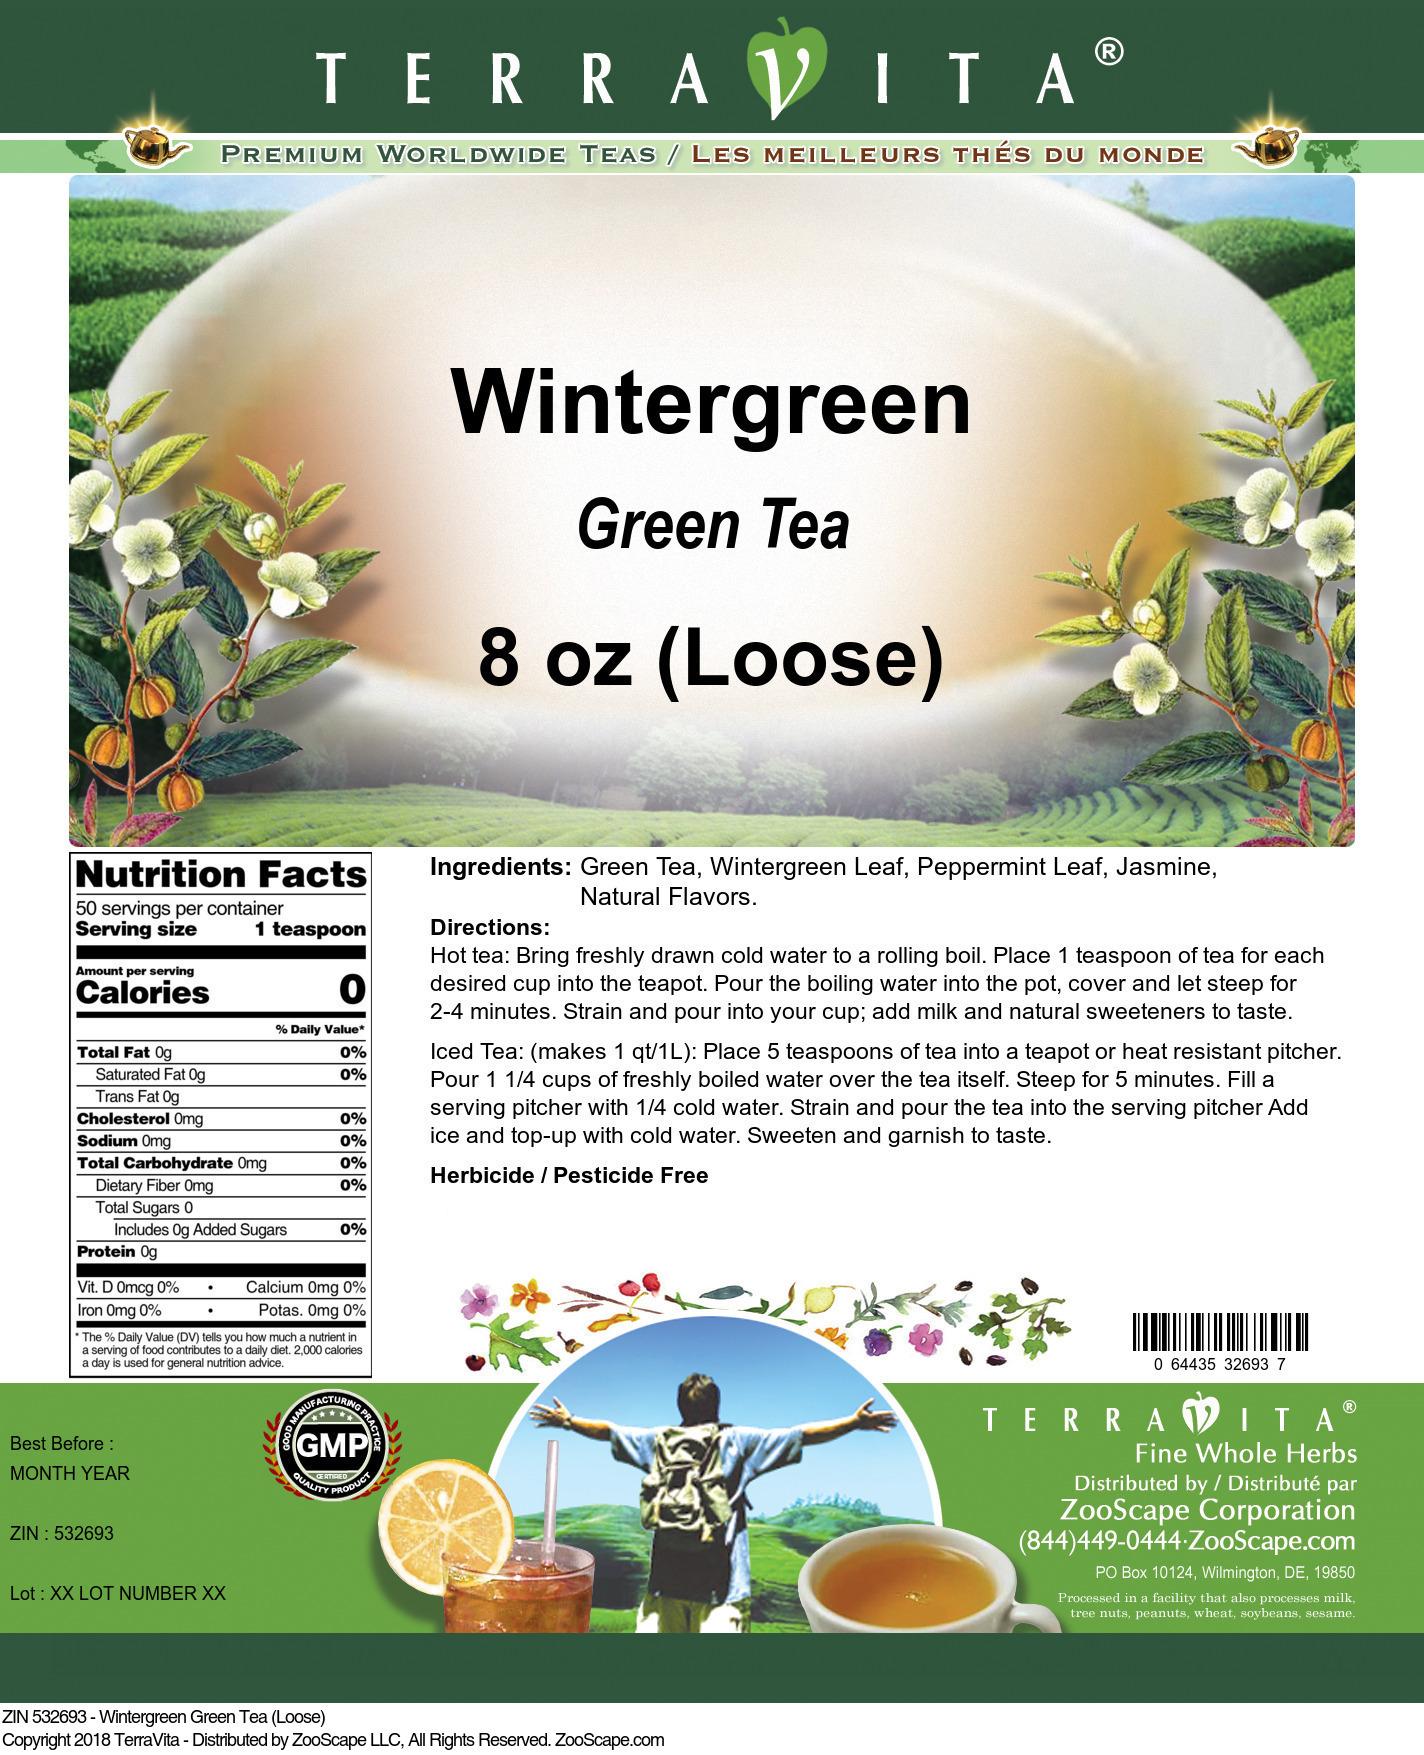 Wintergreen Green Tea